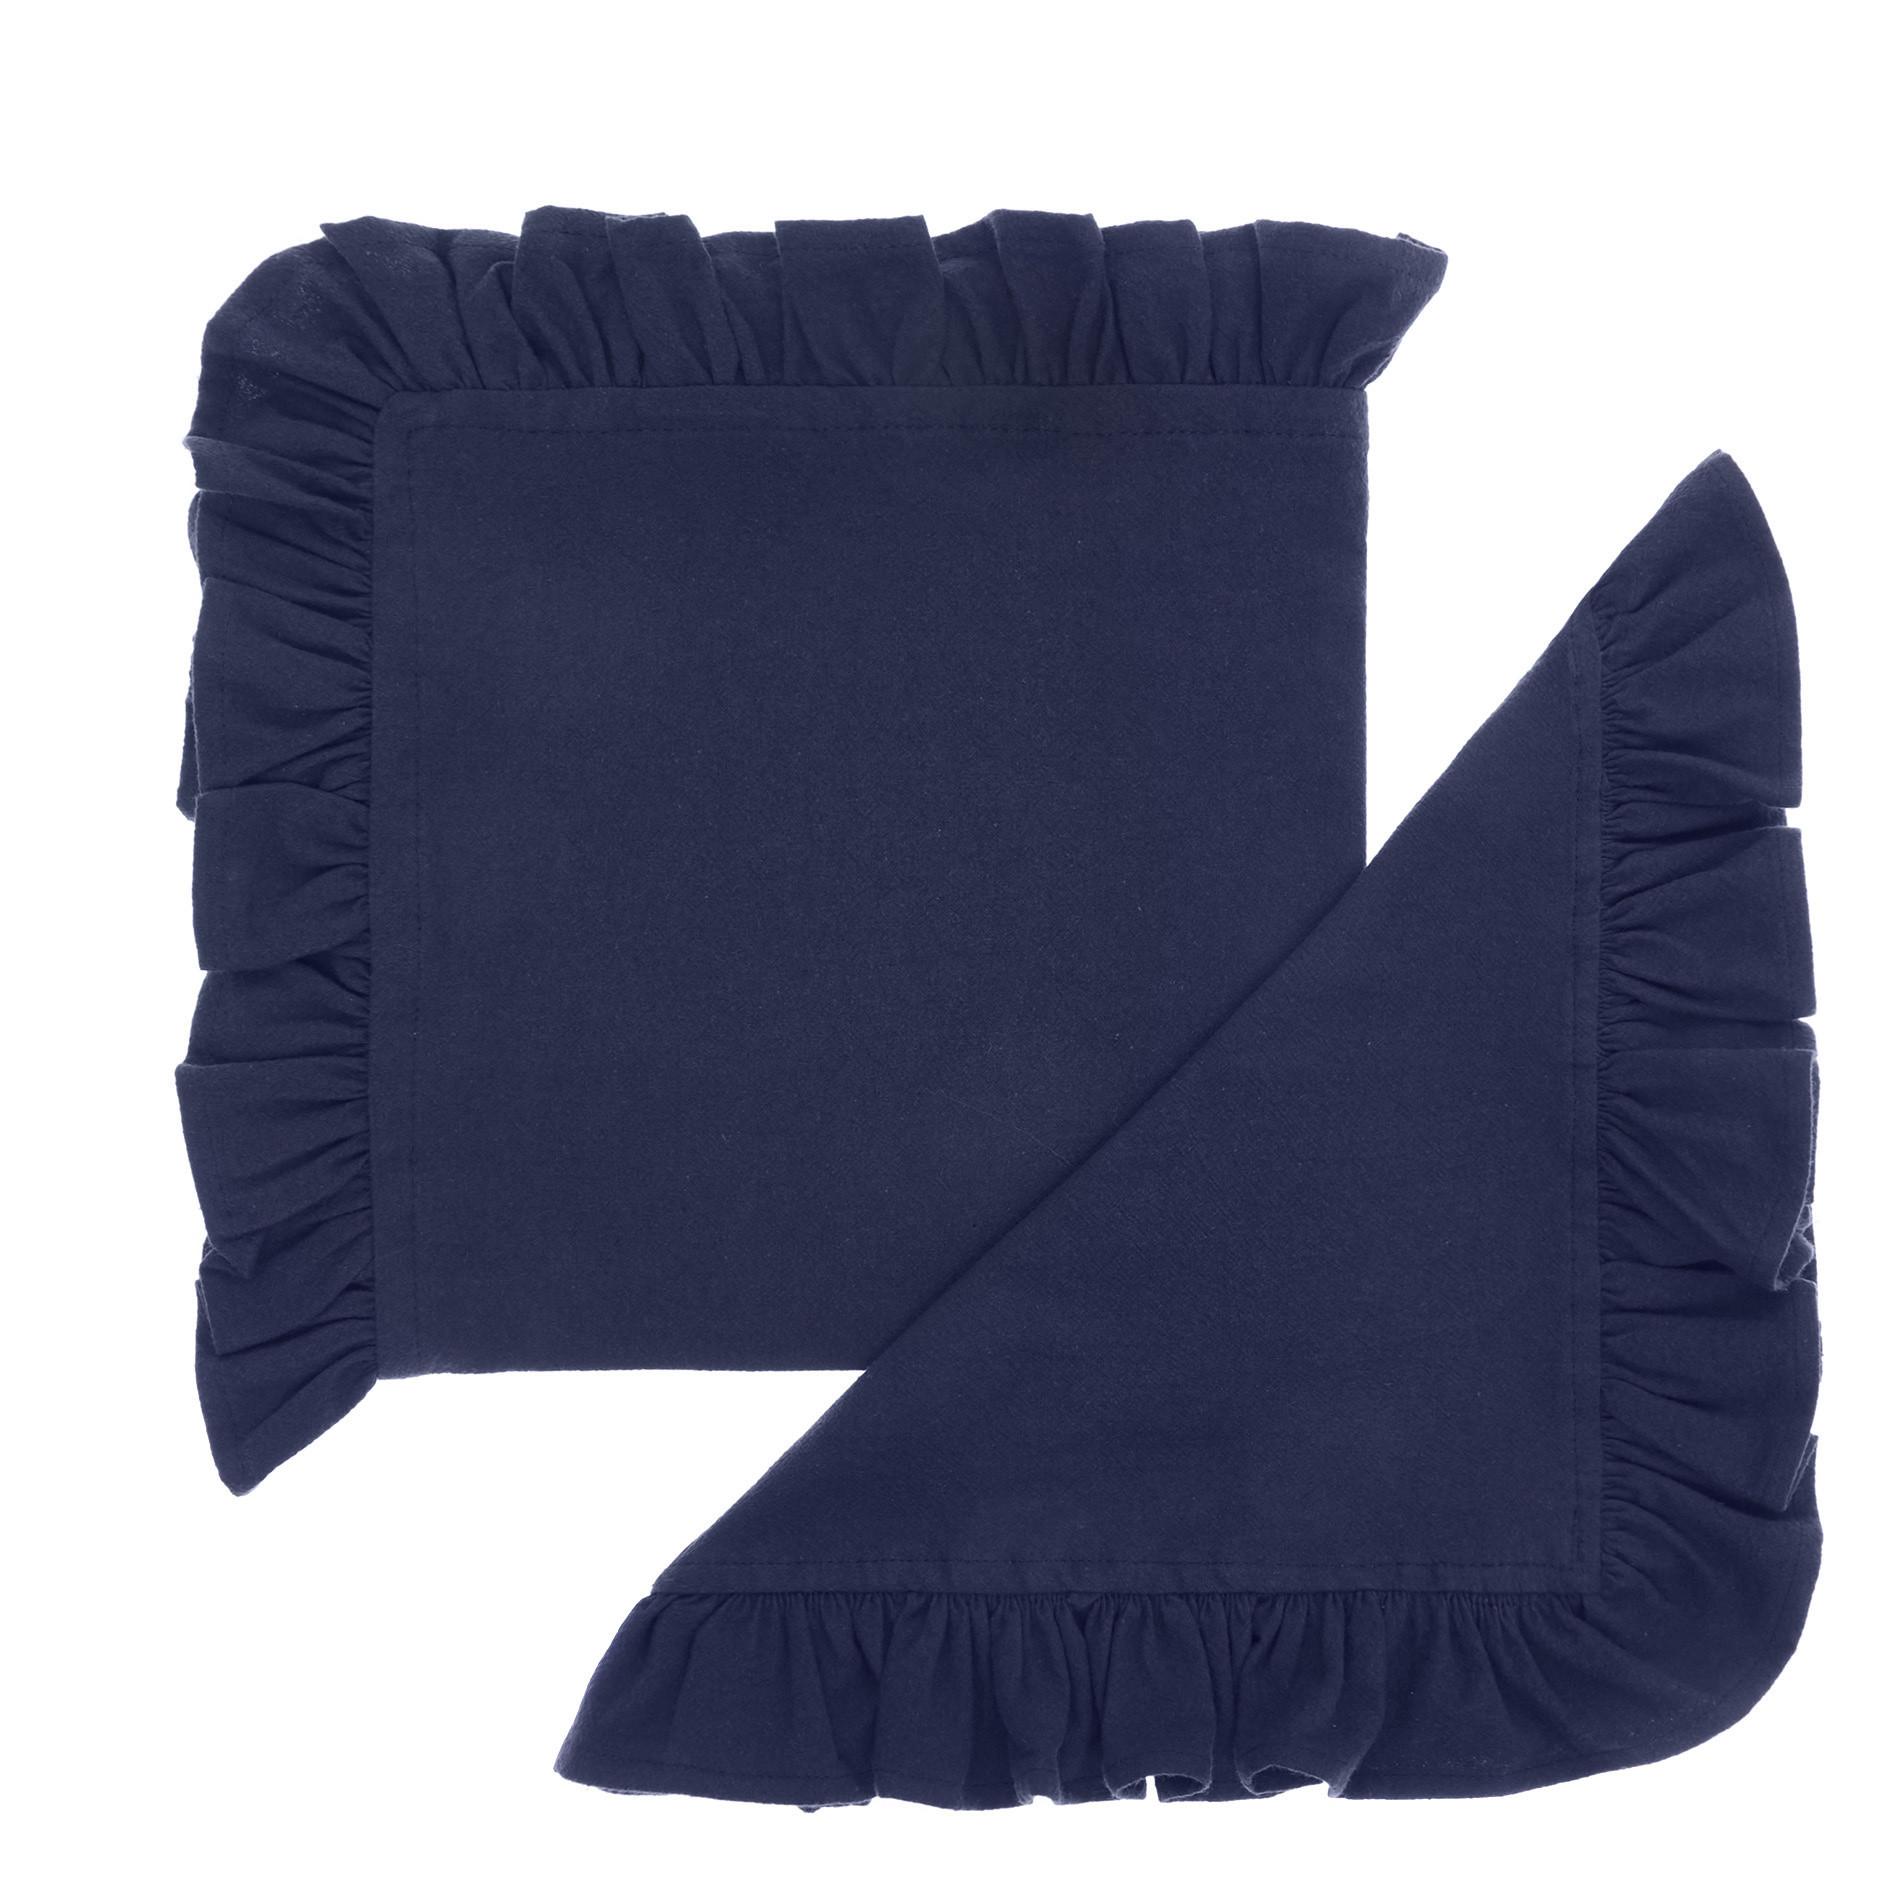 Set 2 tovaglioli puro cotone garment washed bordo volant, Blu scuro, large image number 0